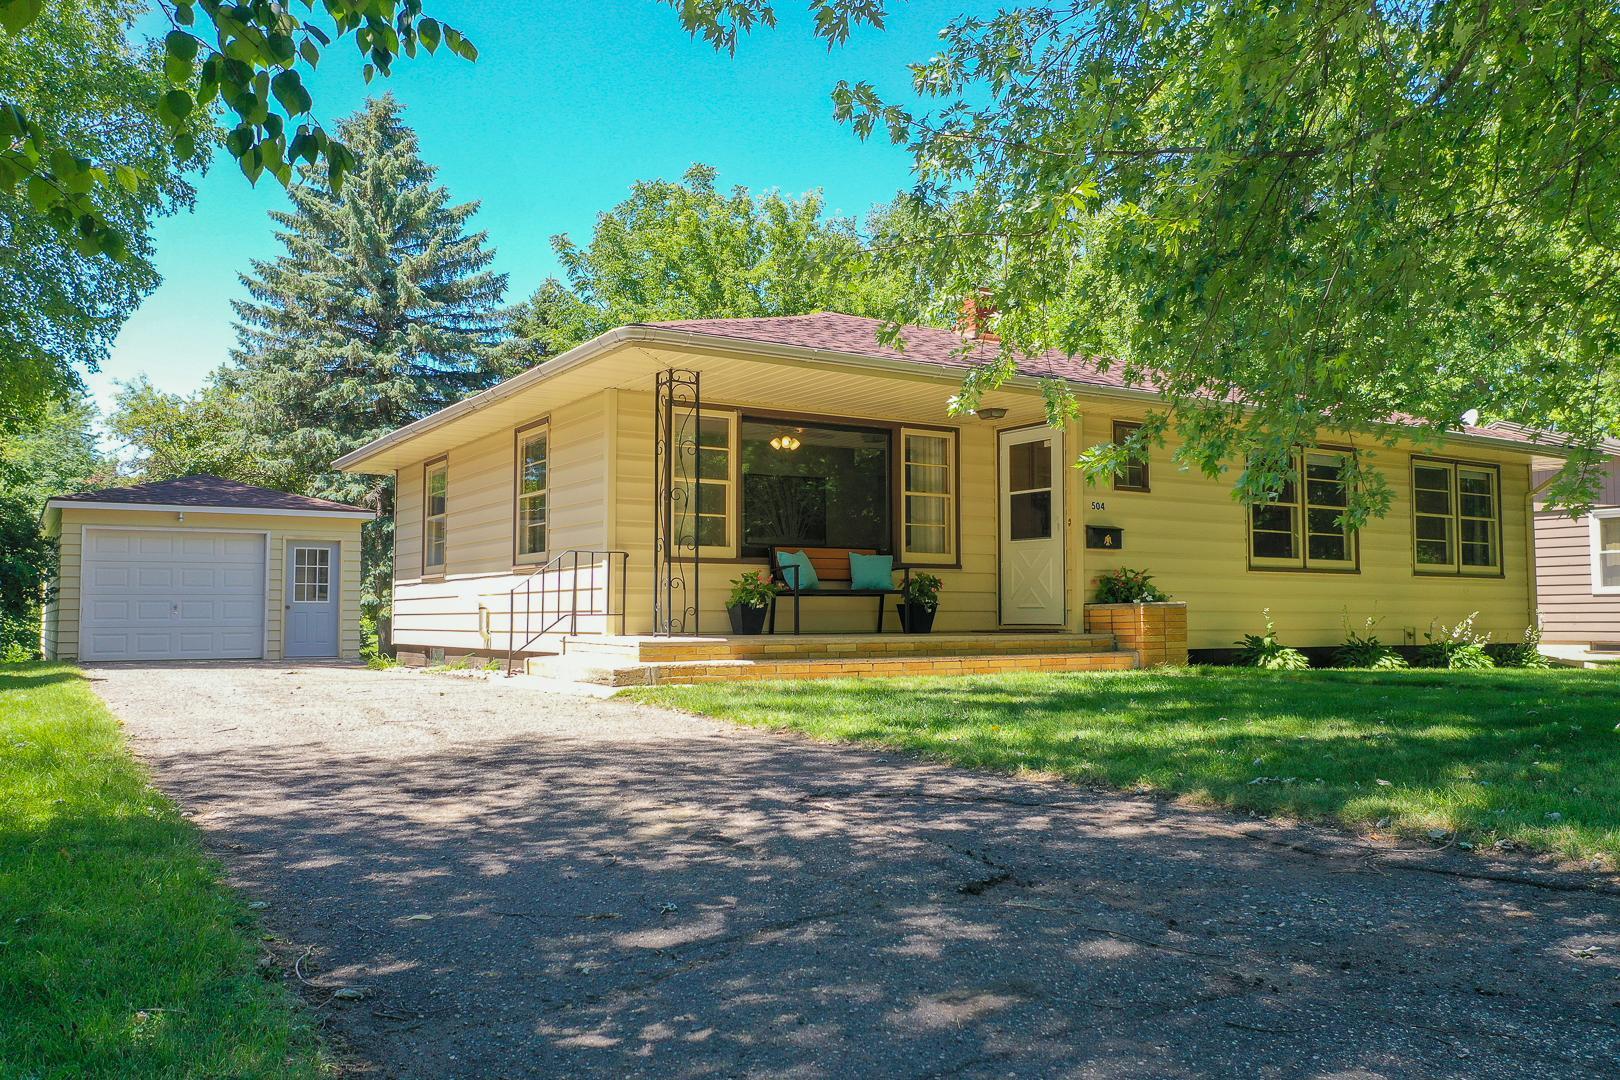 504 3rd SE Property Photo - Glenwood Twp, MN real estate listing